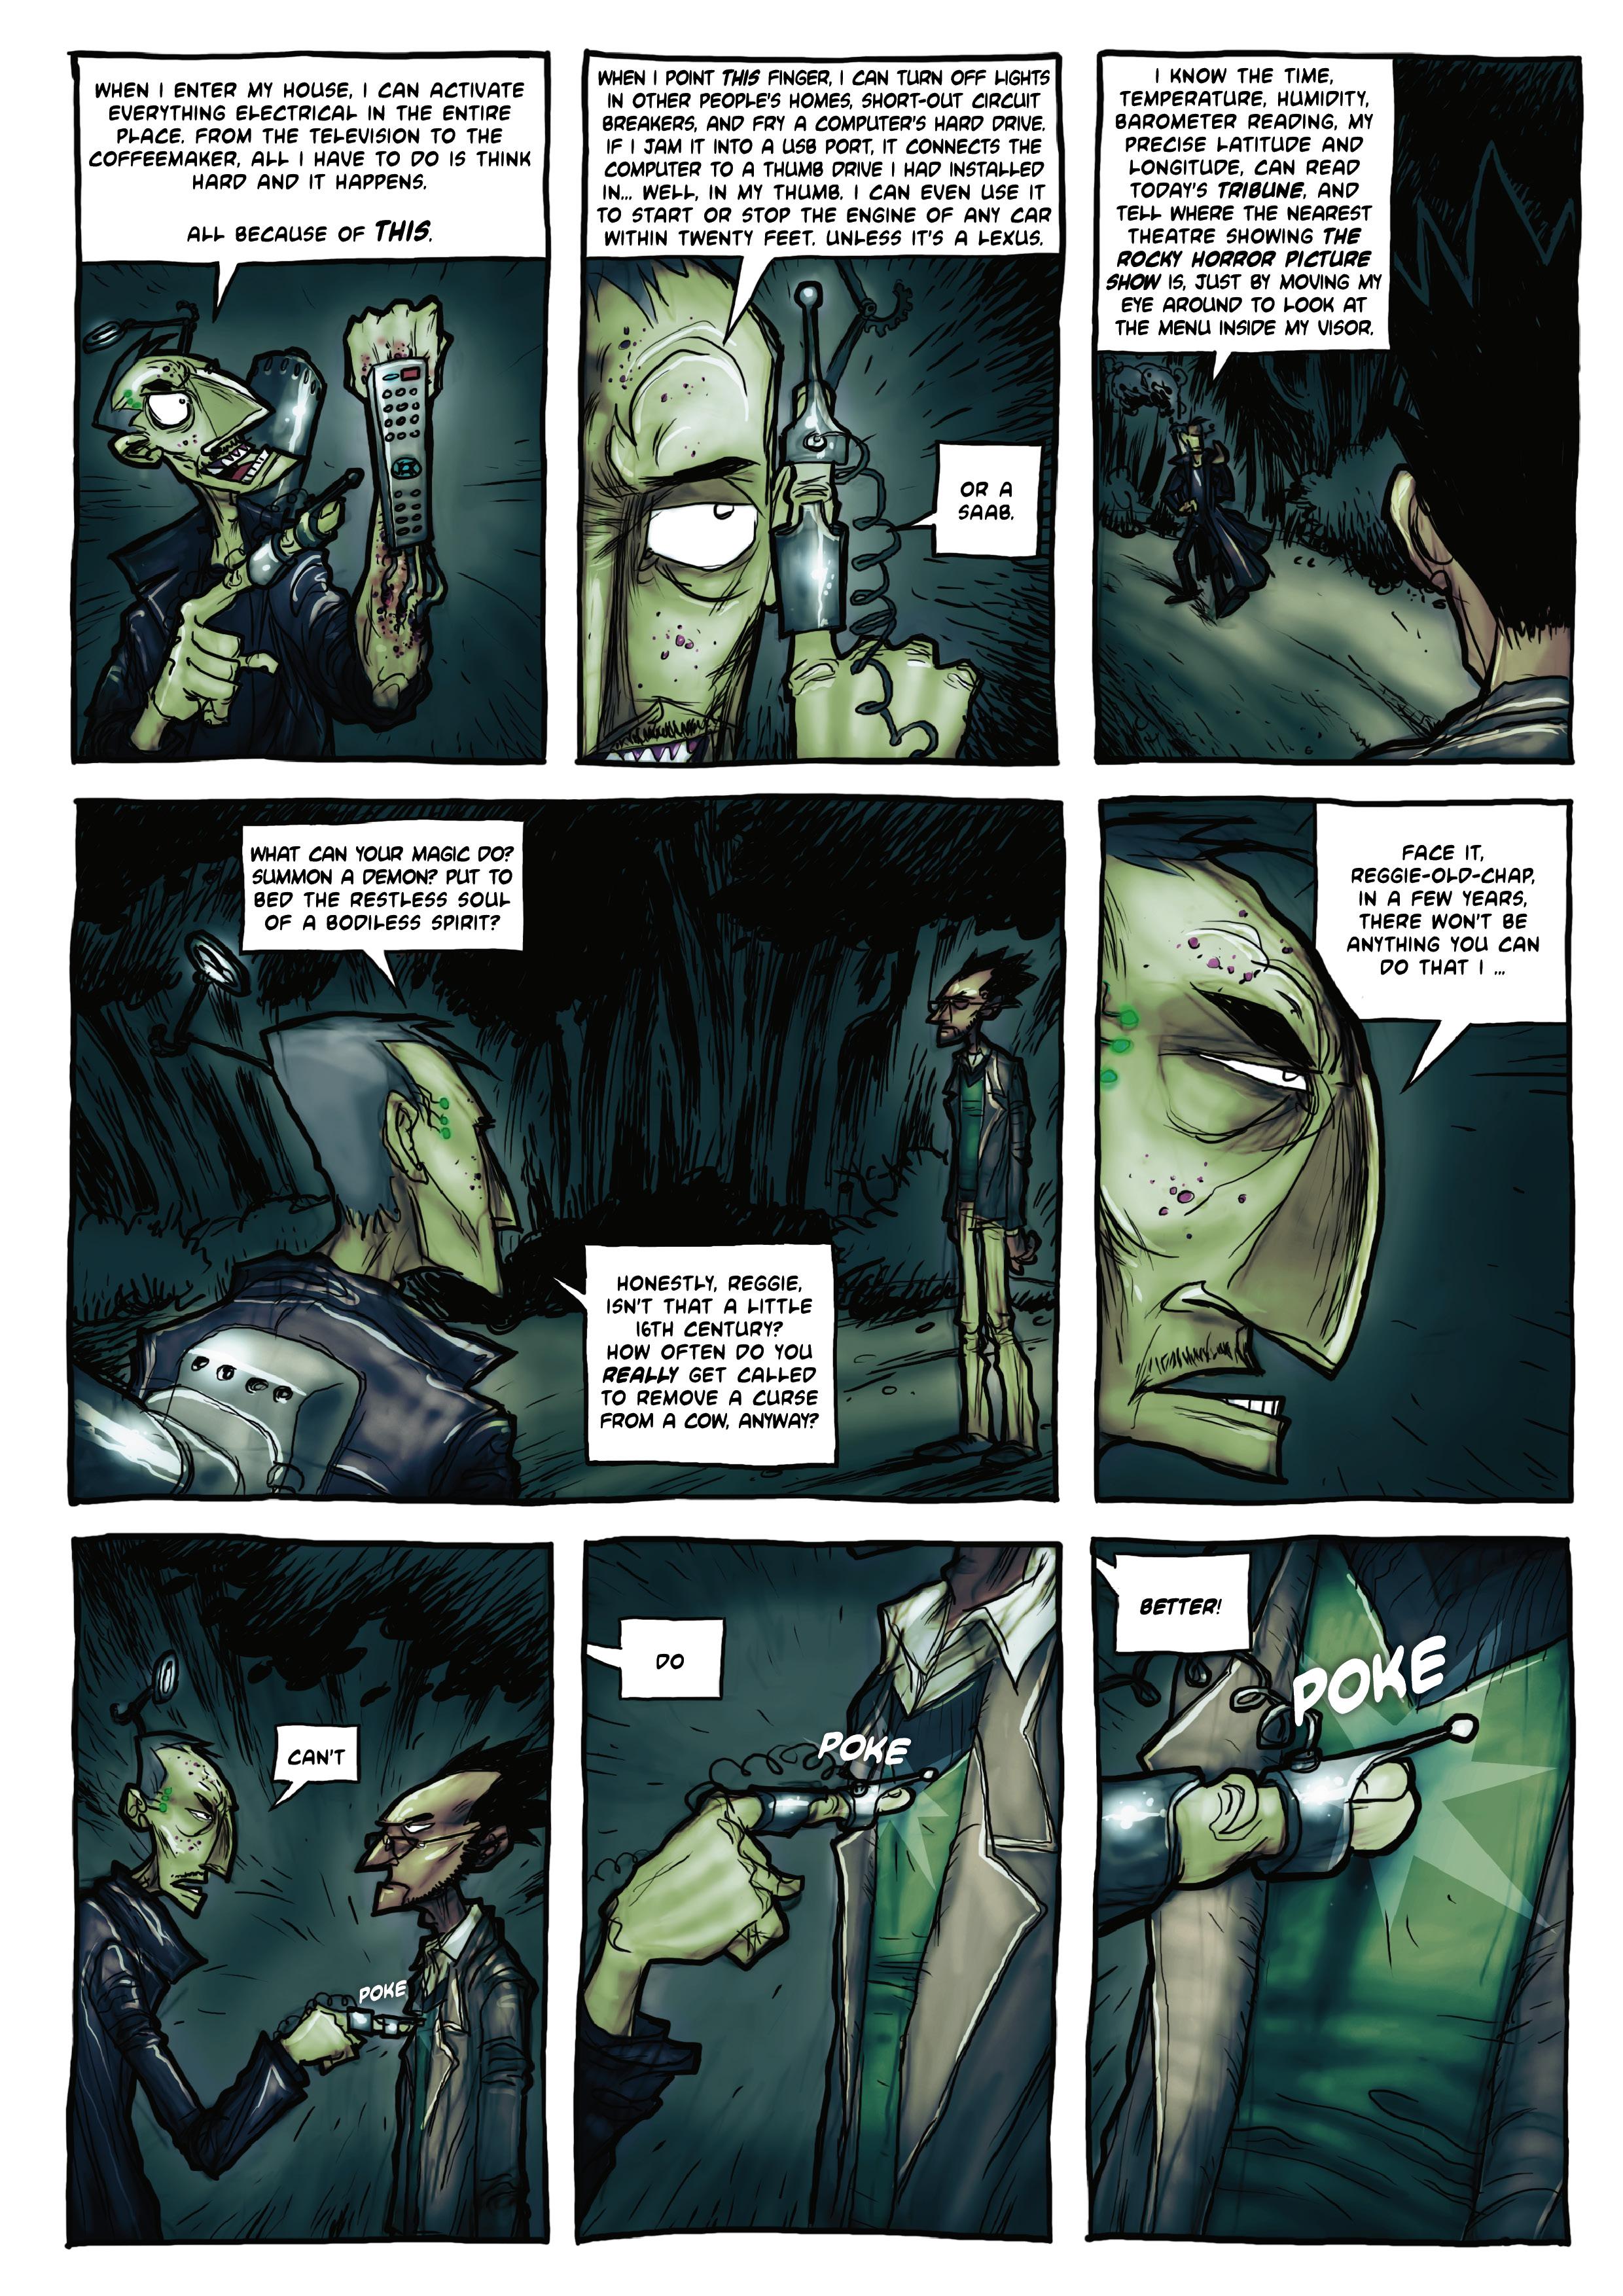 Sir Reginald vs Man-X, page 3, by Art Grafunkel